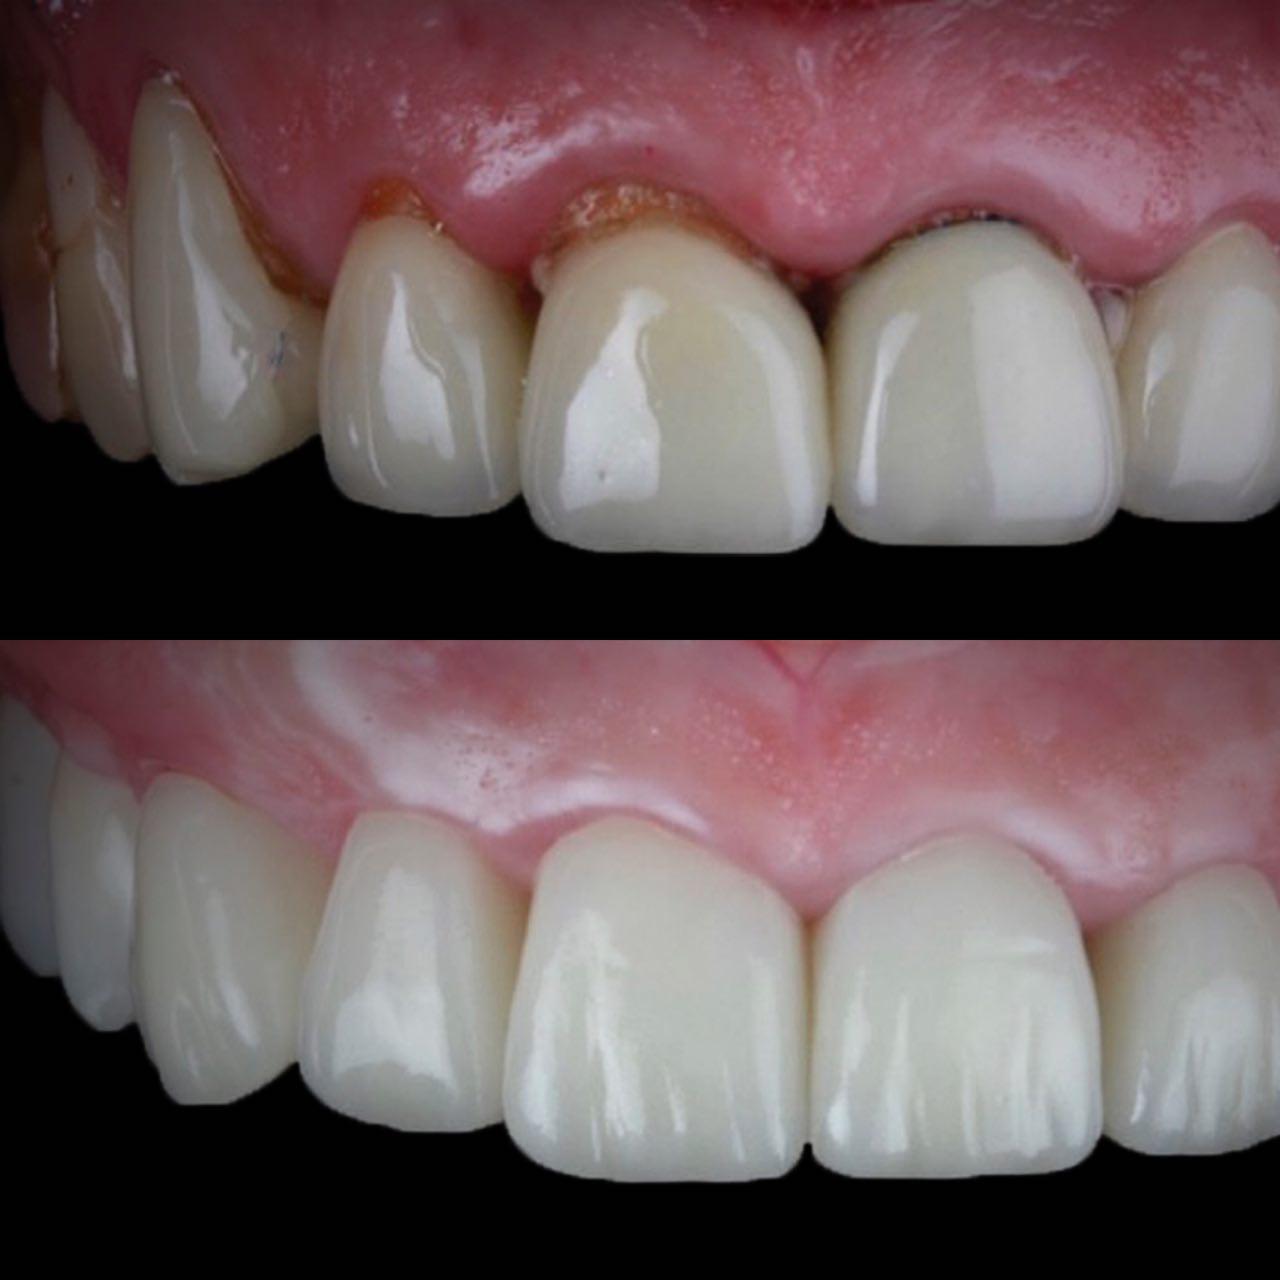 IMG 8A5DD7D7AB66 3 - Протезування зубів